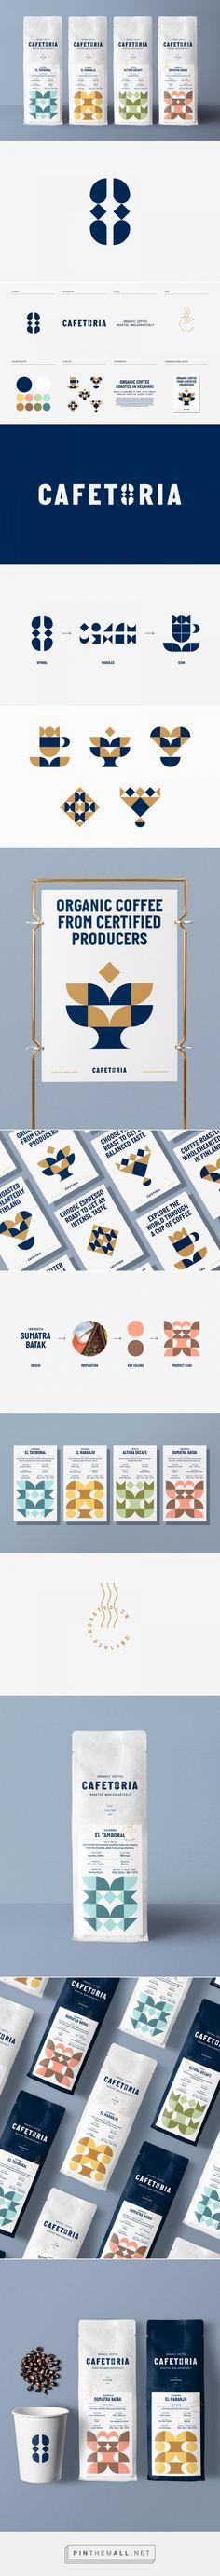 Cafetoria packaging design by Diferente - https://www.packagingoftheworld.com/2018/06/cafetoria.html